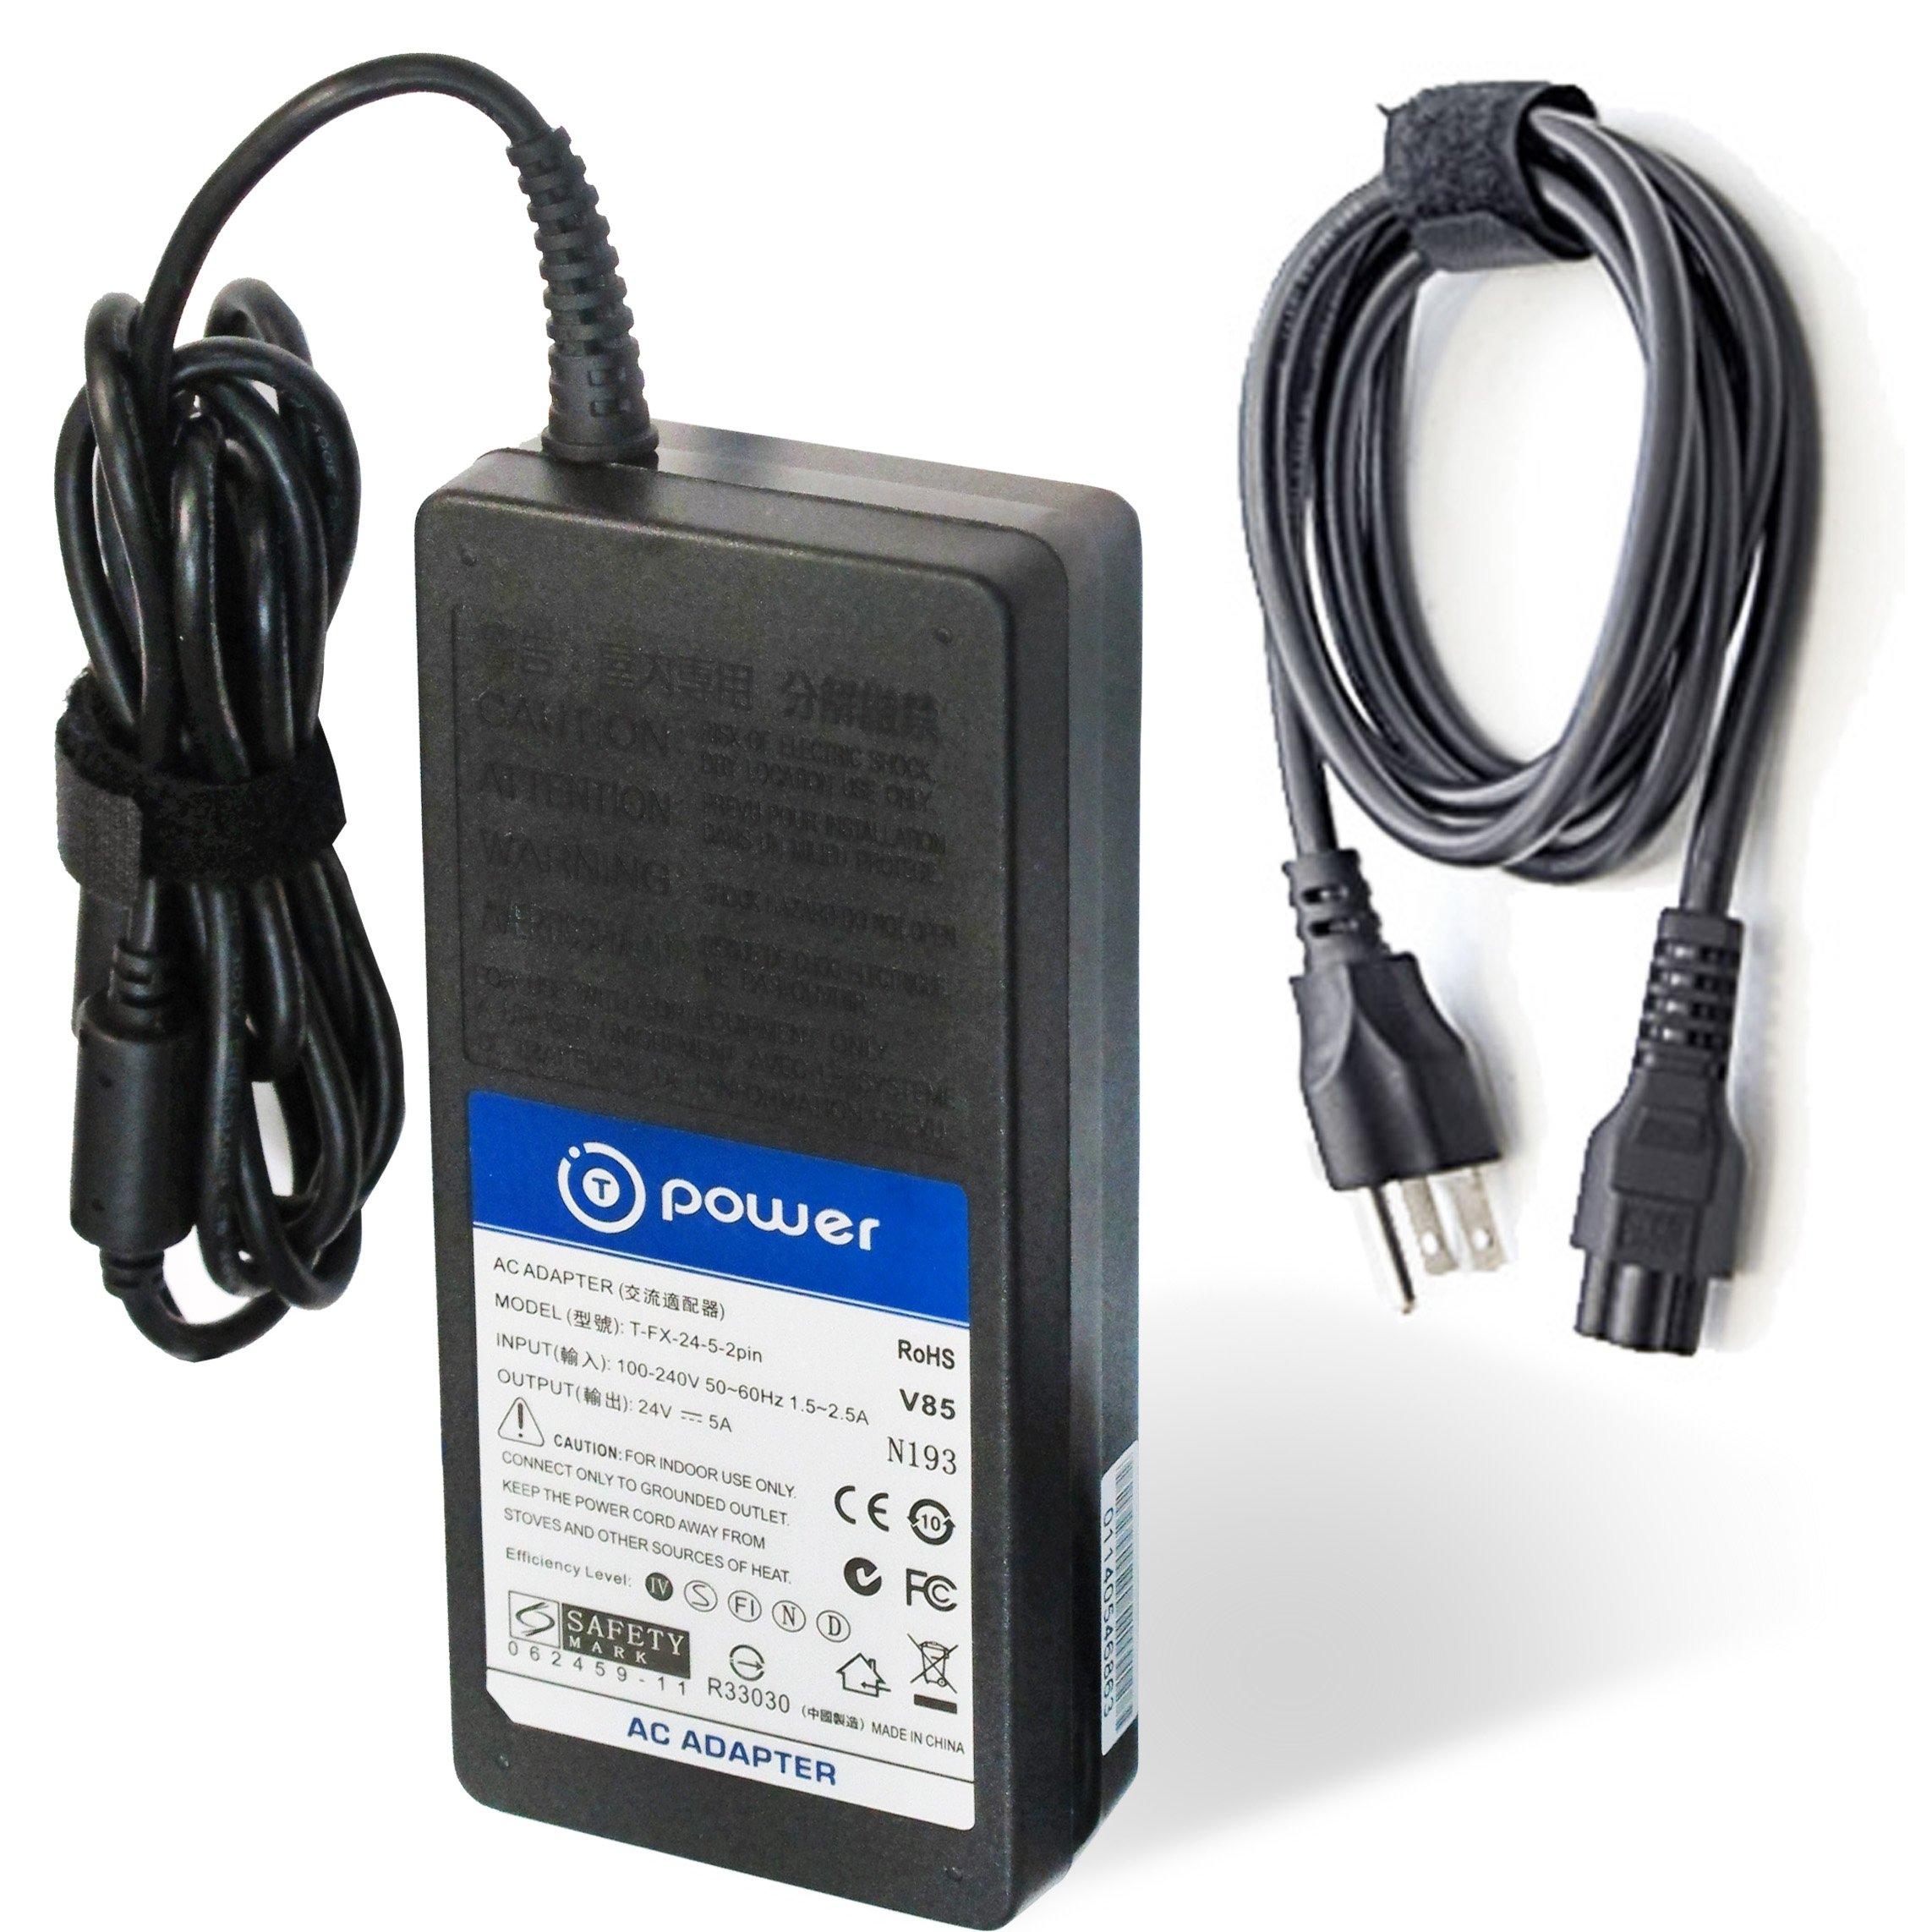 T-Power Ac dc adapter for 24V ( 4-Pin ) Fixed Circular Locked Plug TFT / LCD TV Targa LT3010 FSP180-AAA FSP FSP150-AAAN1 9NA1501700 FSP150-ABB 9NA1500900 FSP150-ABA Charger Power Supply Cord